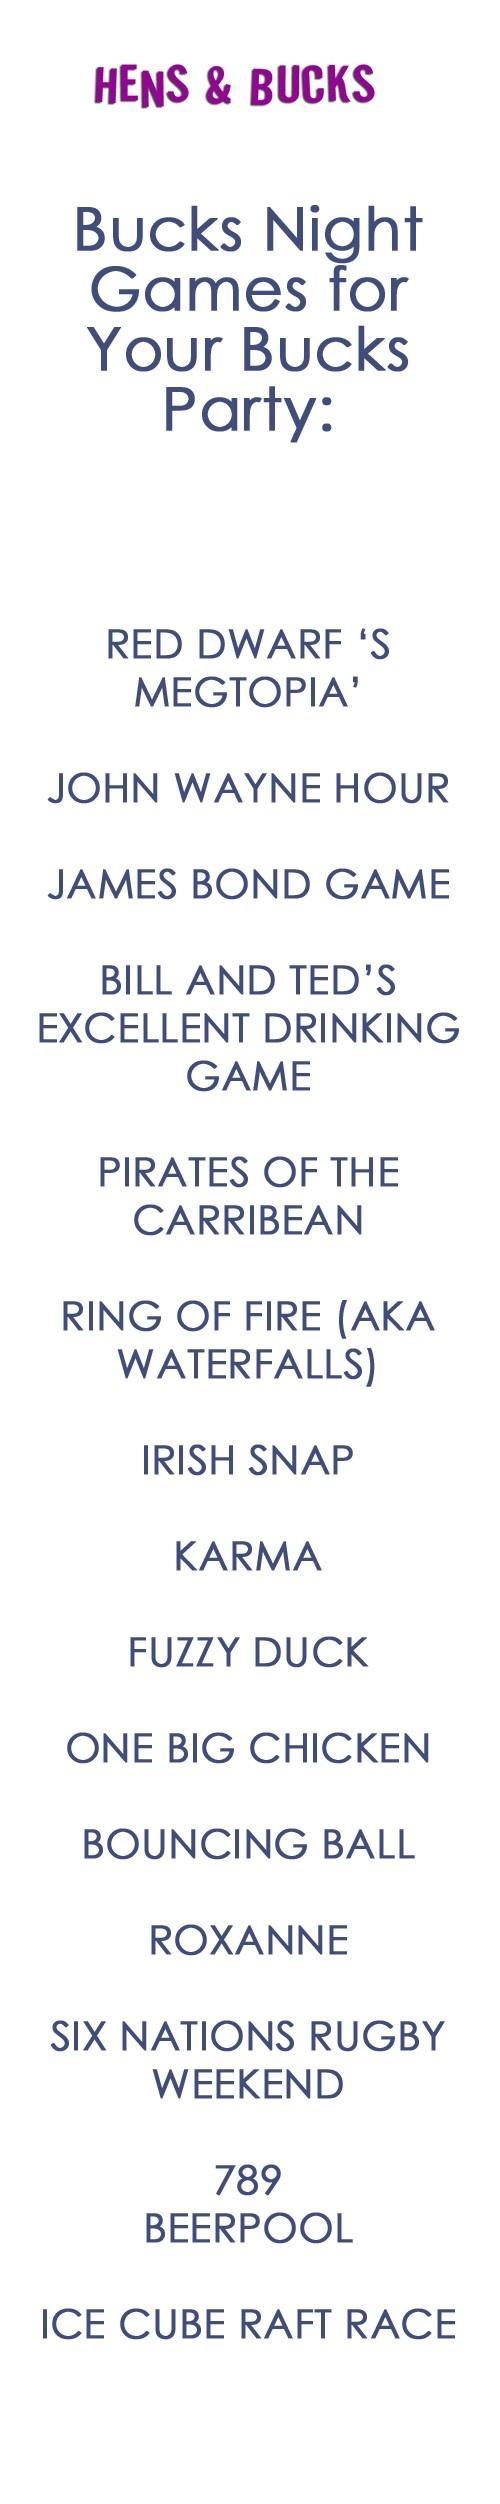 Bucks Party Games